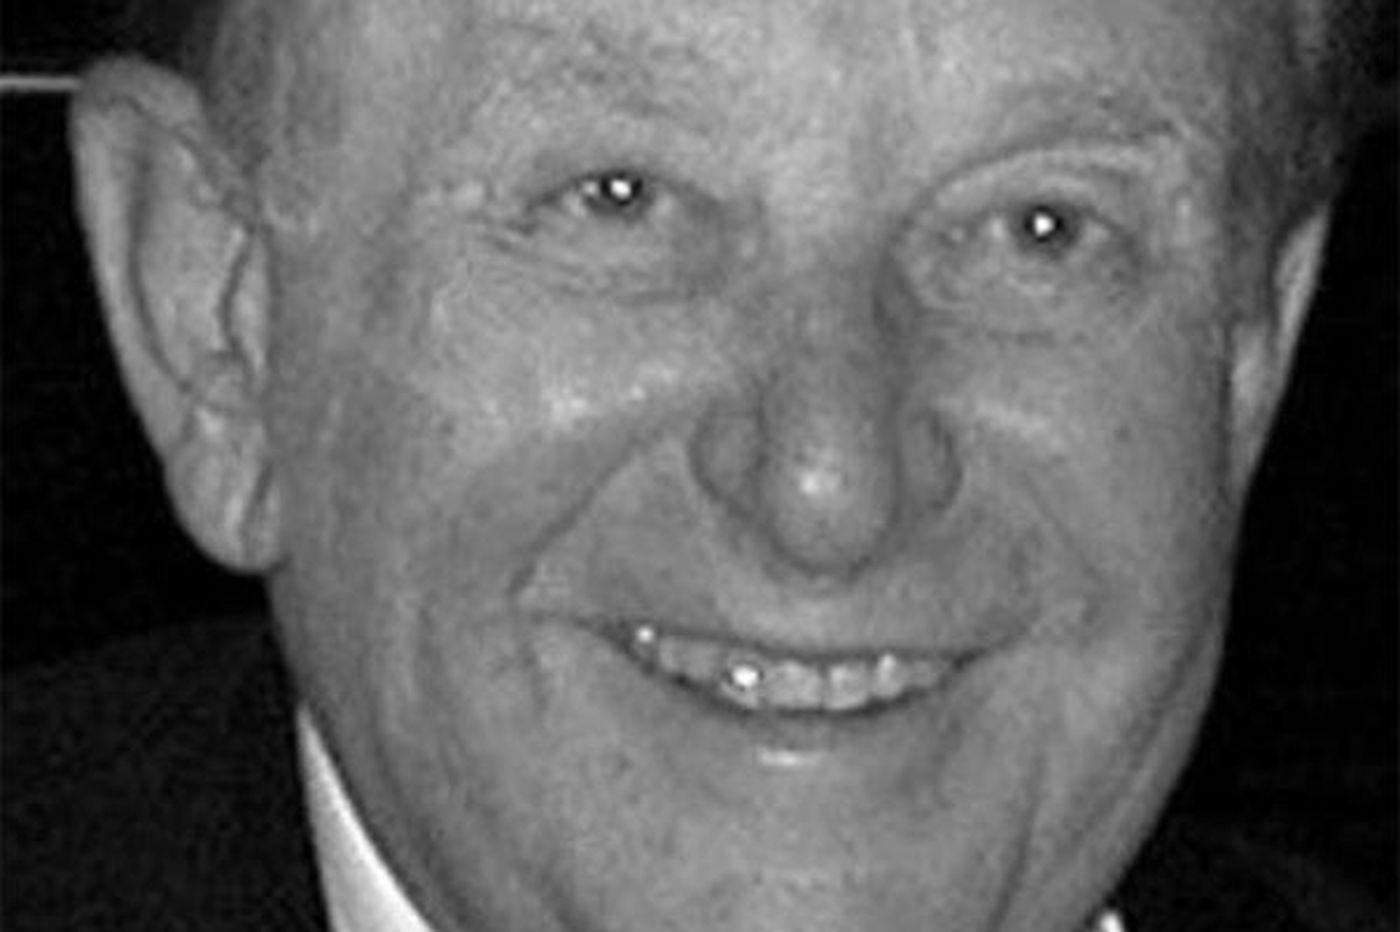 Carl Goldenberg, 85, of Peanut Chew fame